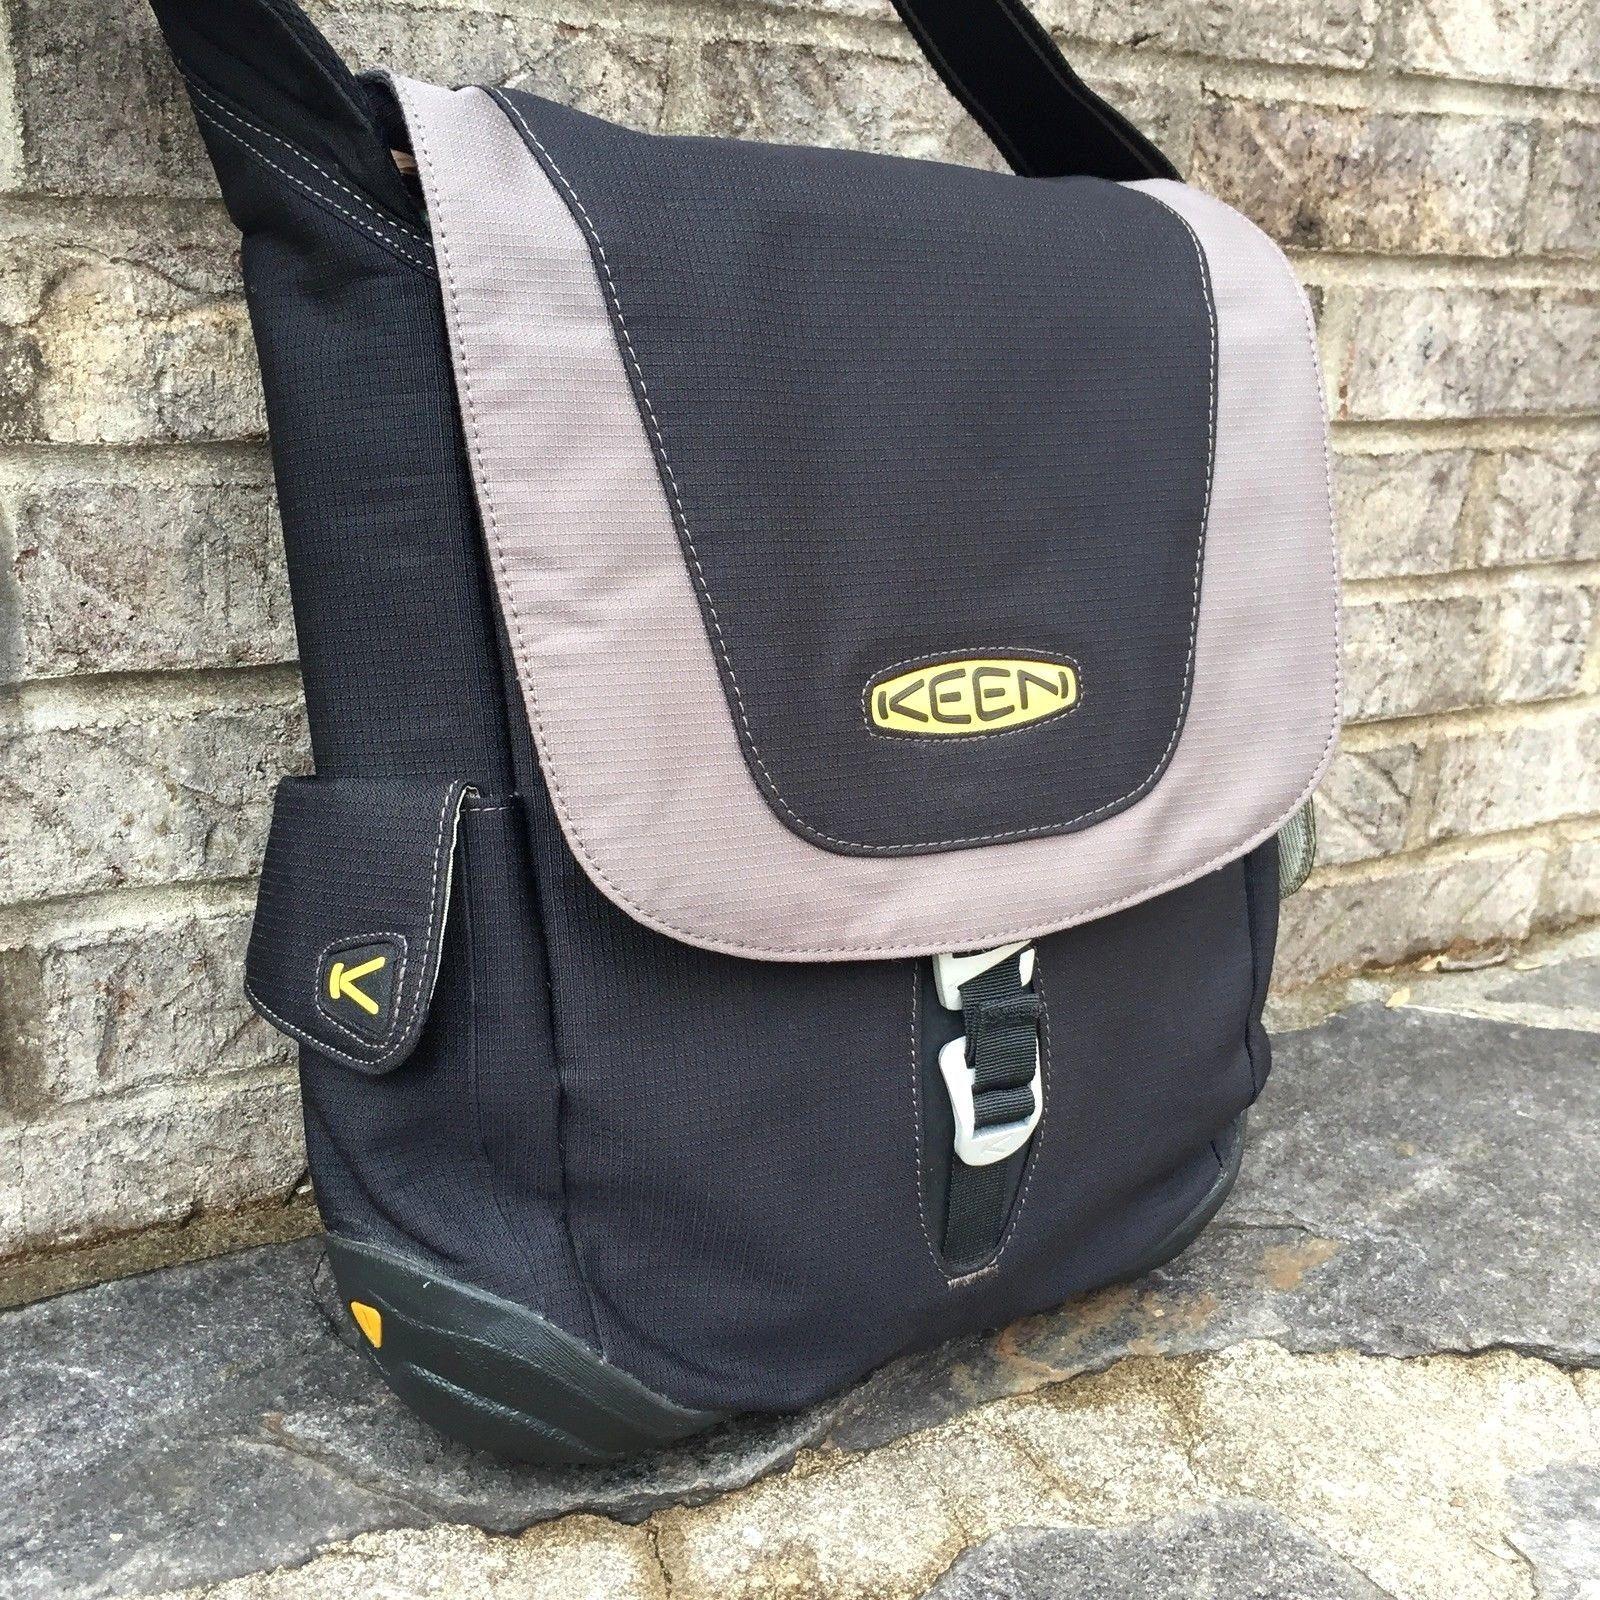 04a59593d26 Keen Messenger Bag Crossbody Black Gray Eco-Friendly Recycled Hybrid  Transport | eBay